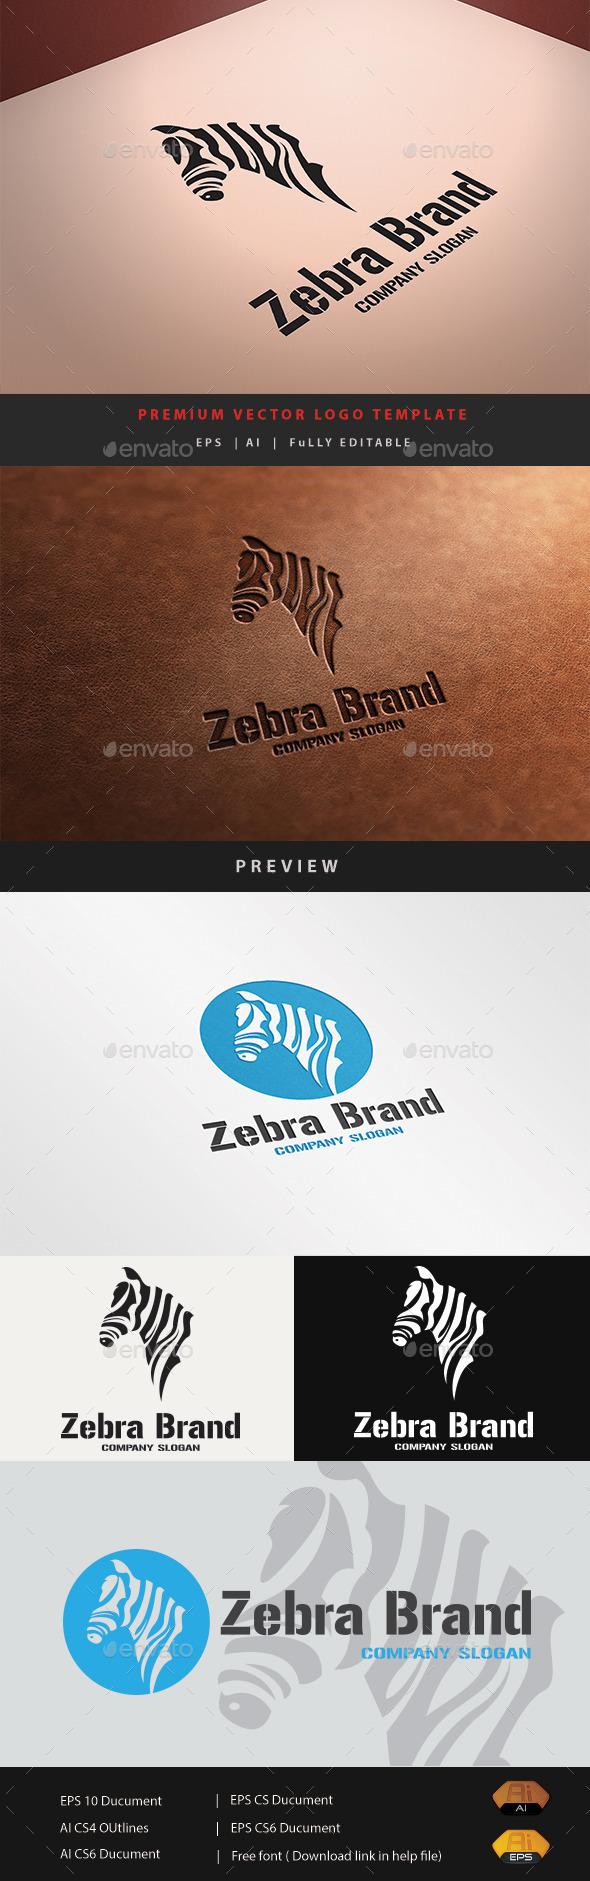 GraphicRiver Zebra Brand 10807146